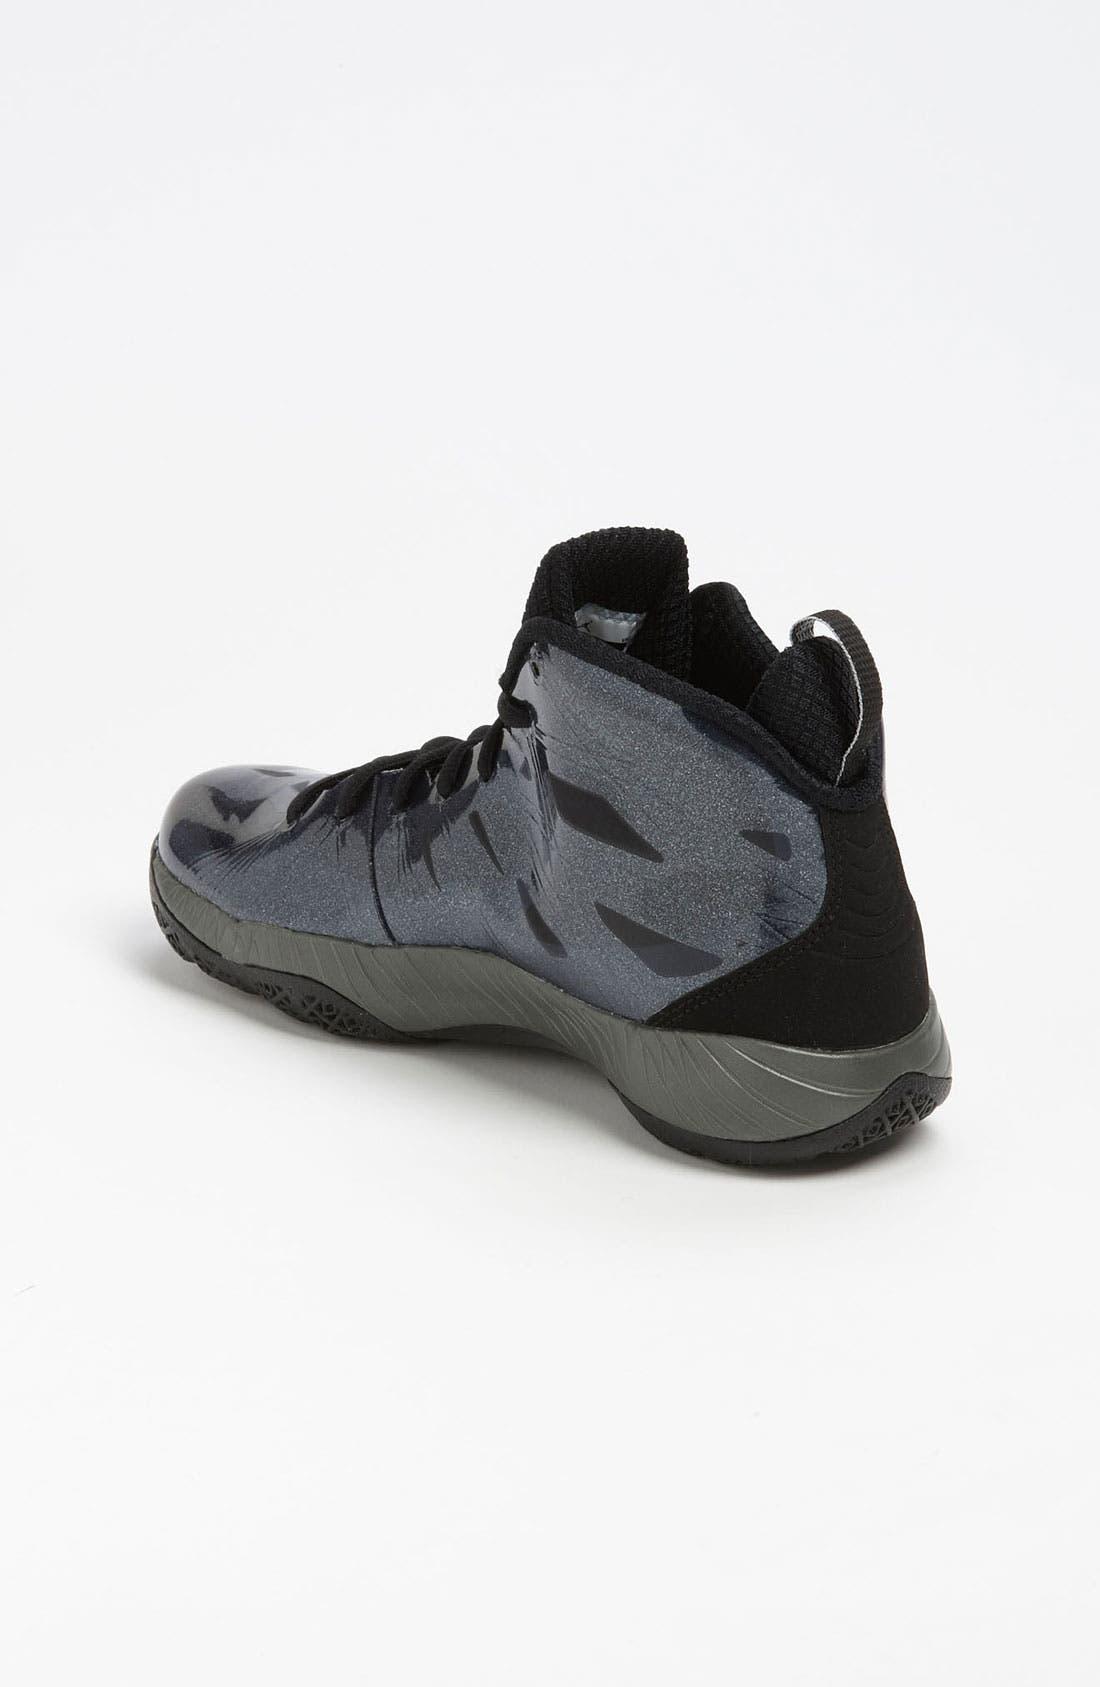 Alternate Image 2  - Nike 'Air Jordan 2012 Lite' Athletic Shoe (Big Kid)